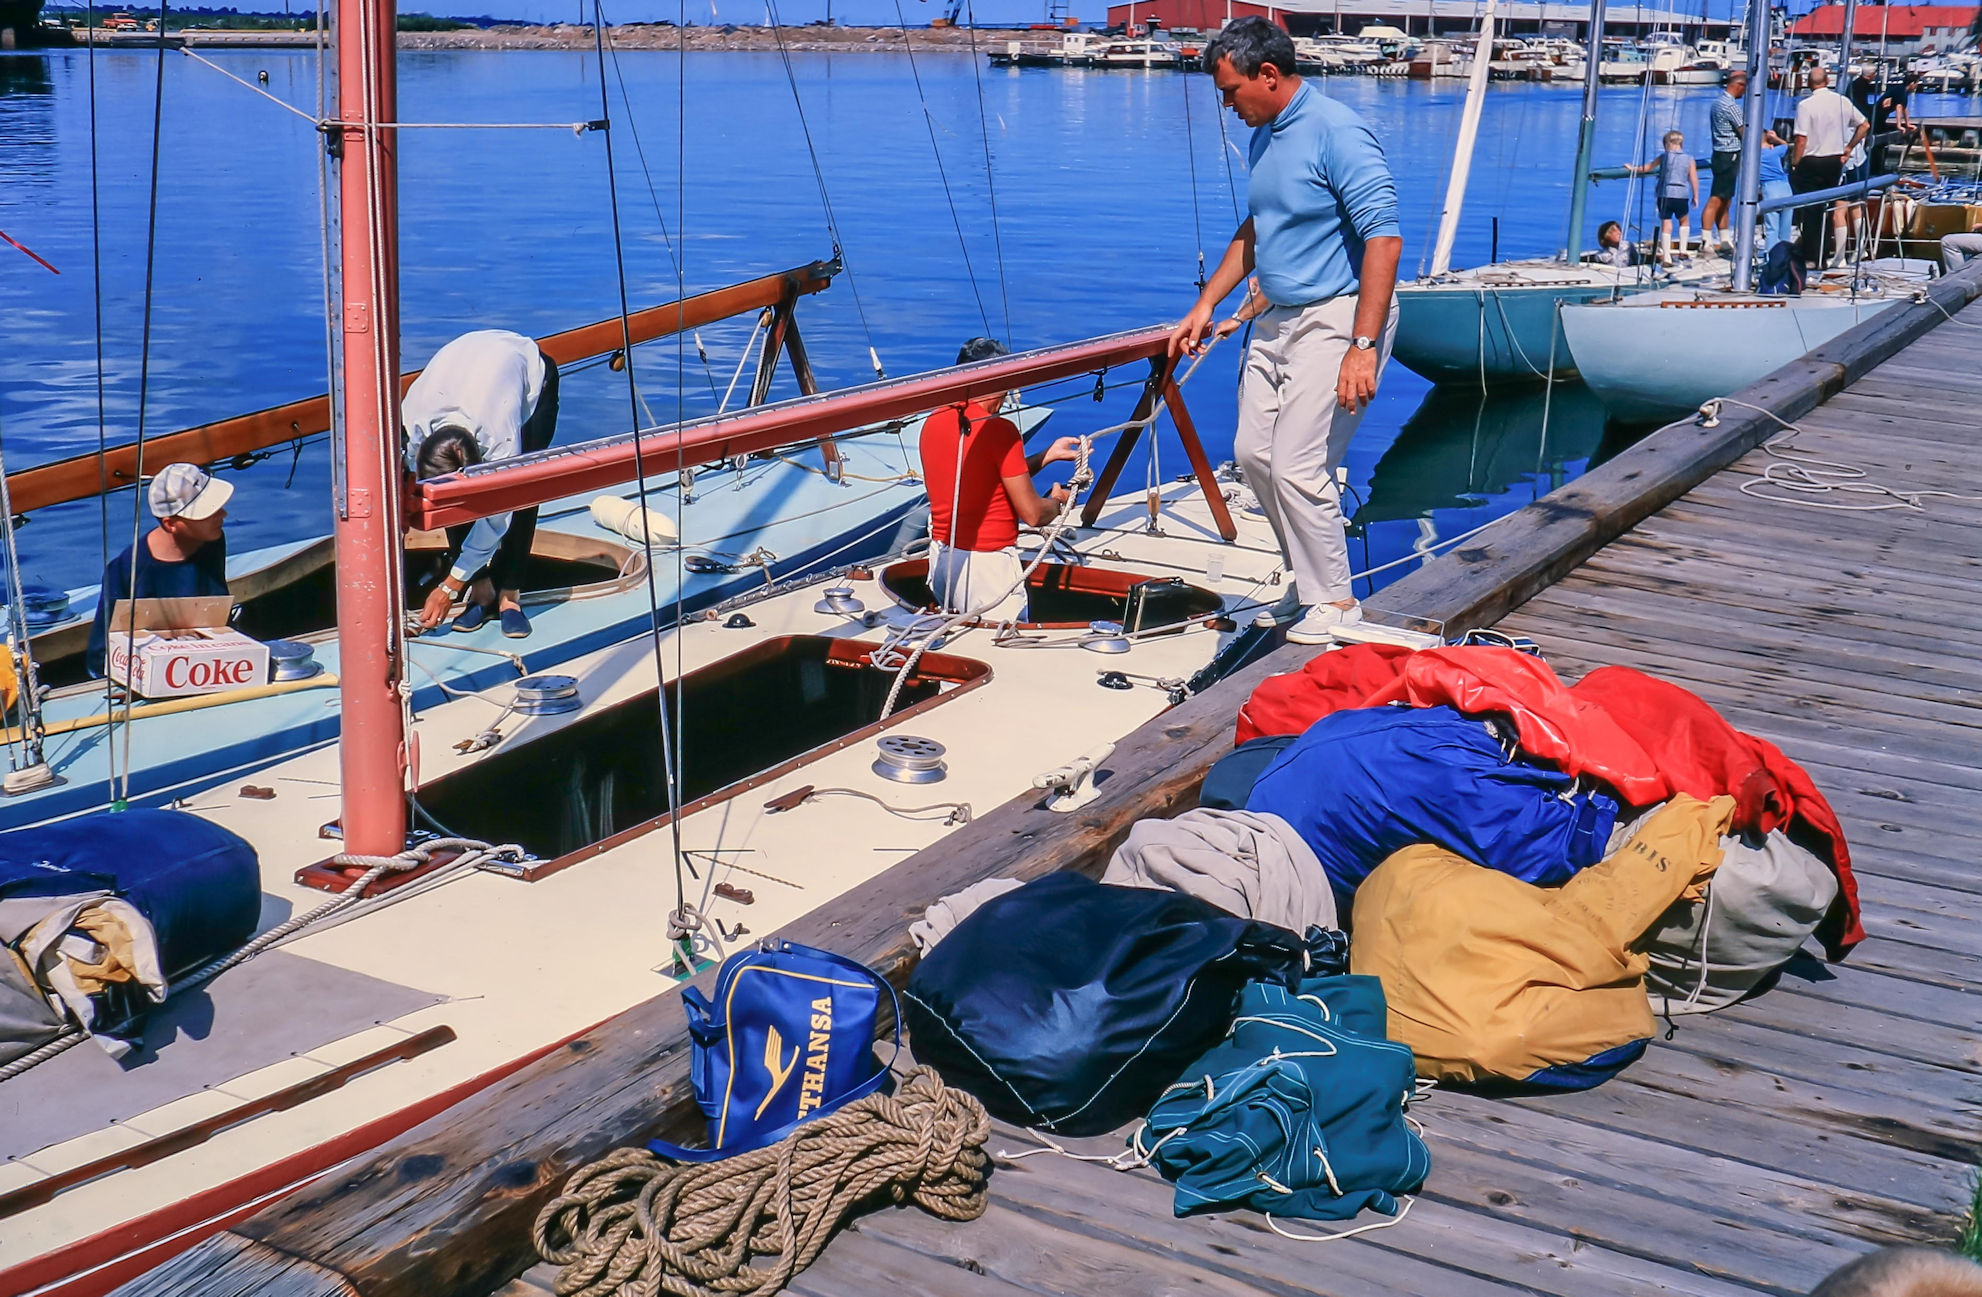 Boats alongside a pontoon. Sail bags and belongings are on the potoon.